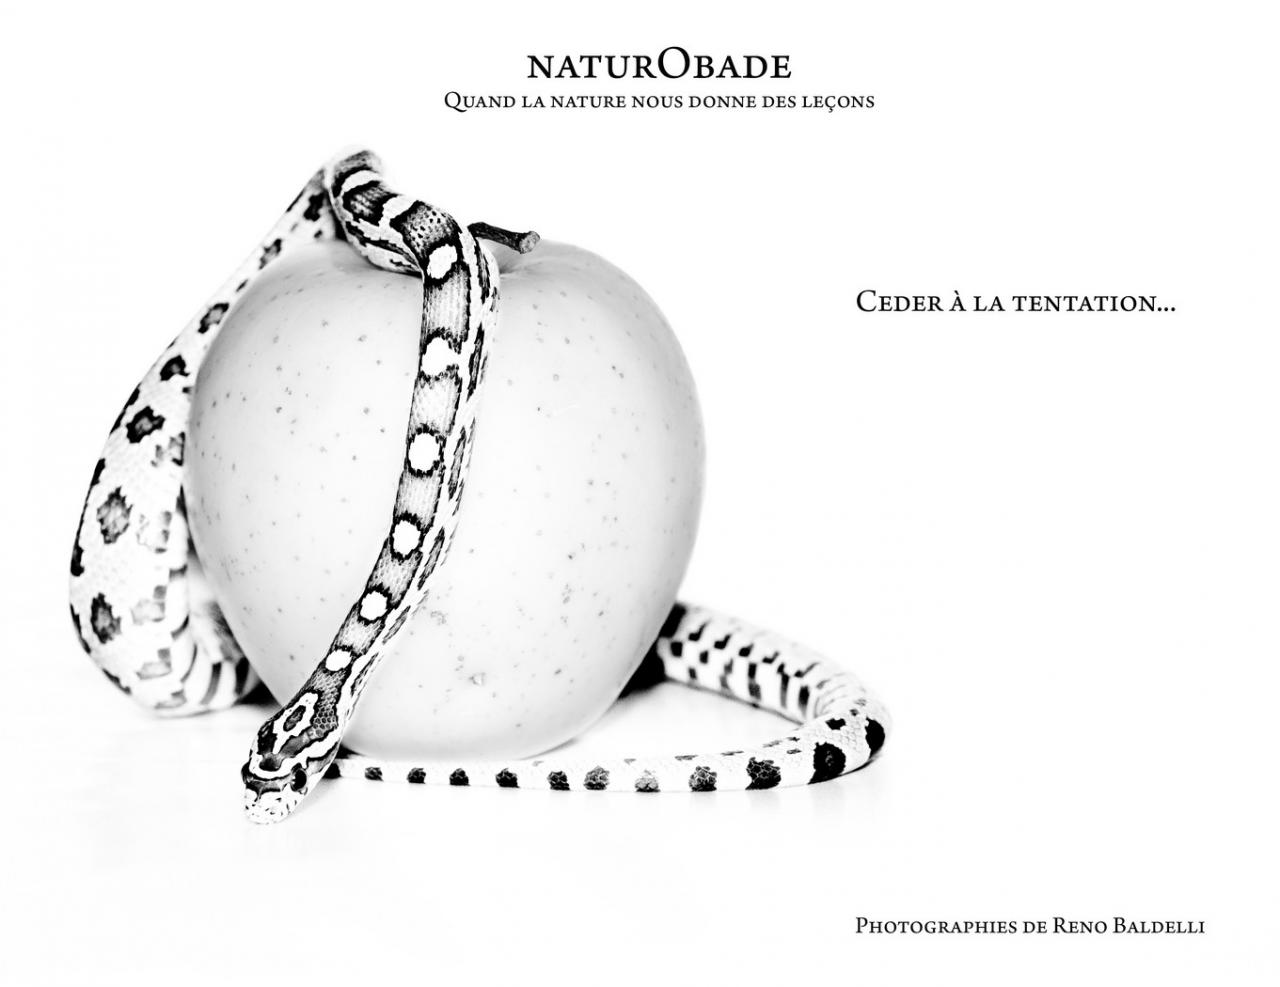 naturobade-couverture-finale-copier.jpg